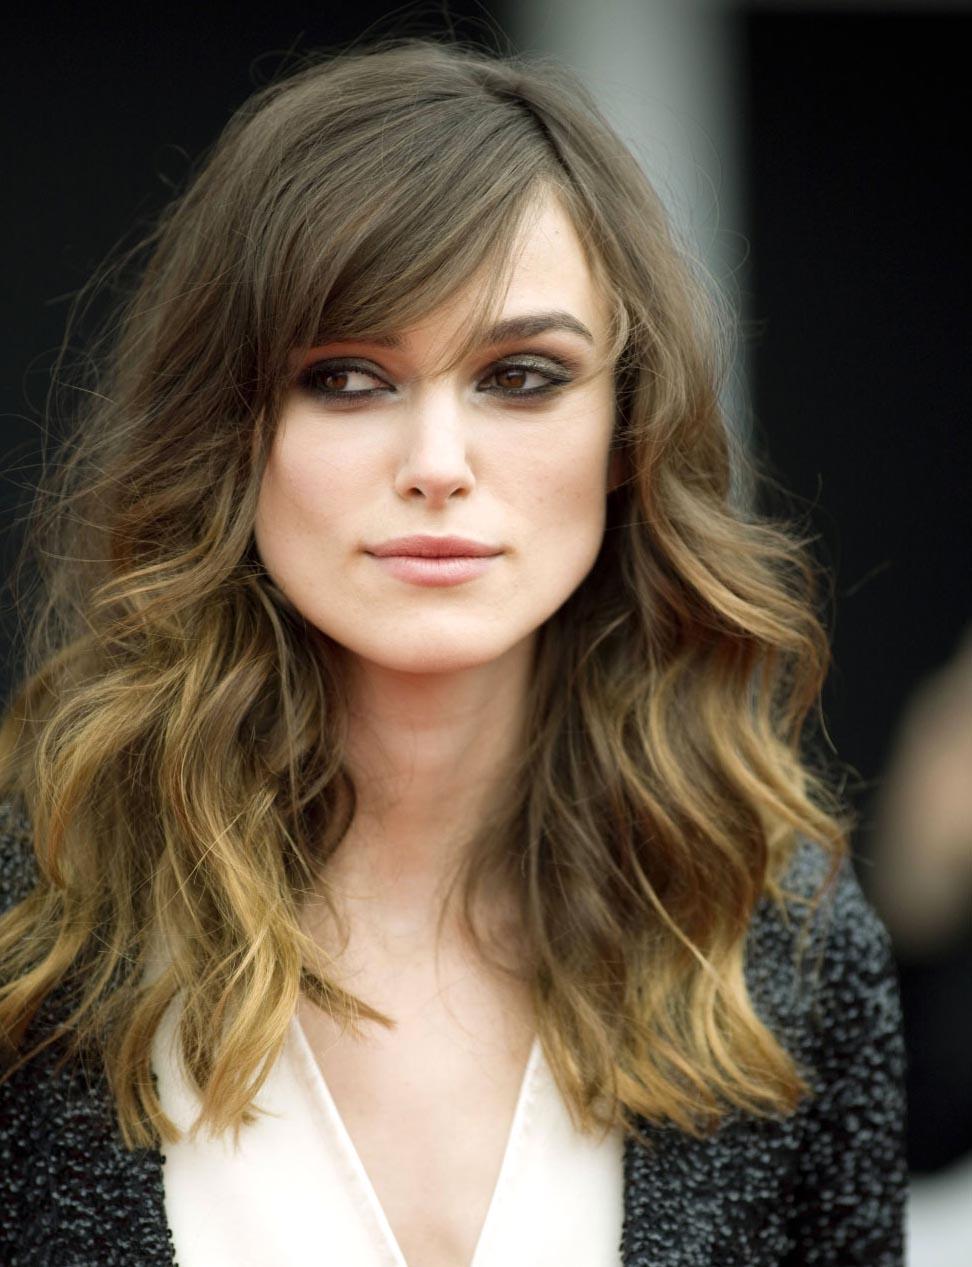 Enjoyable Top 10 Best Hairstyles For Big Foreheads Female Short Hairstyles Gunalazisus